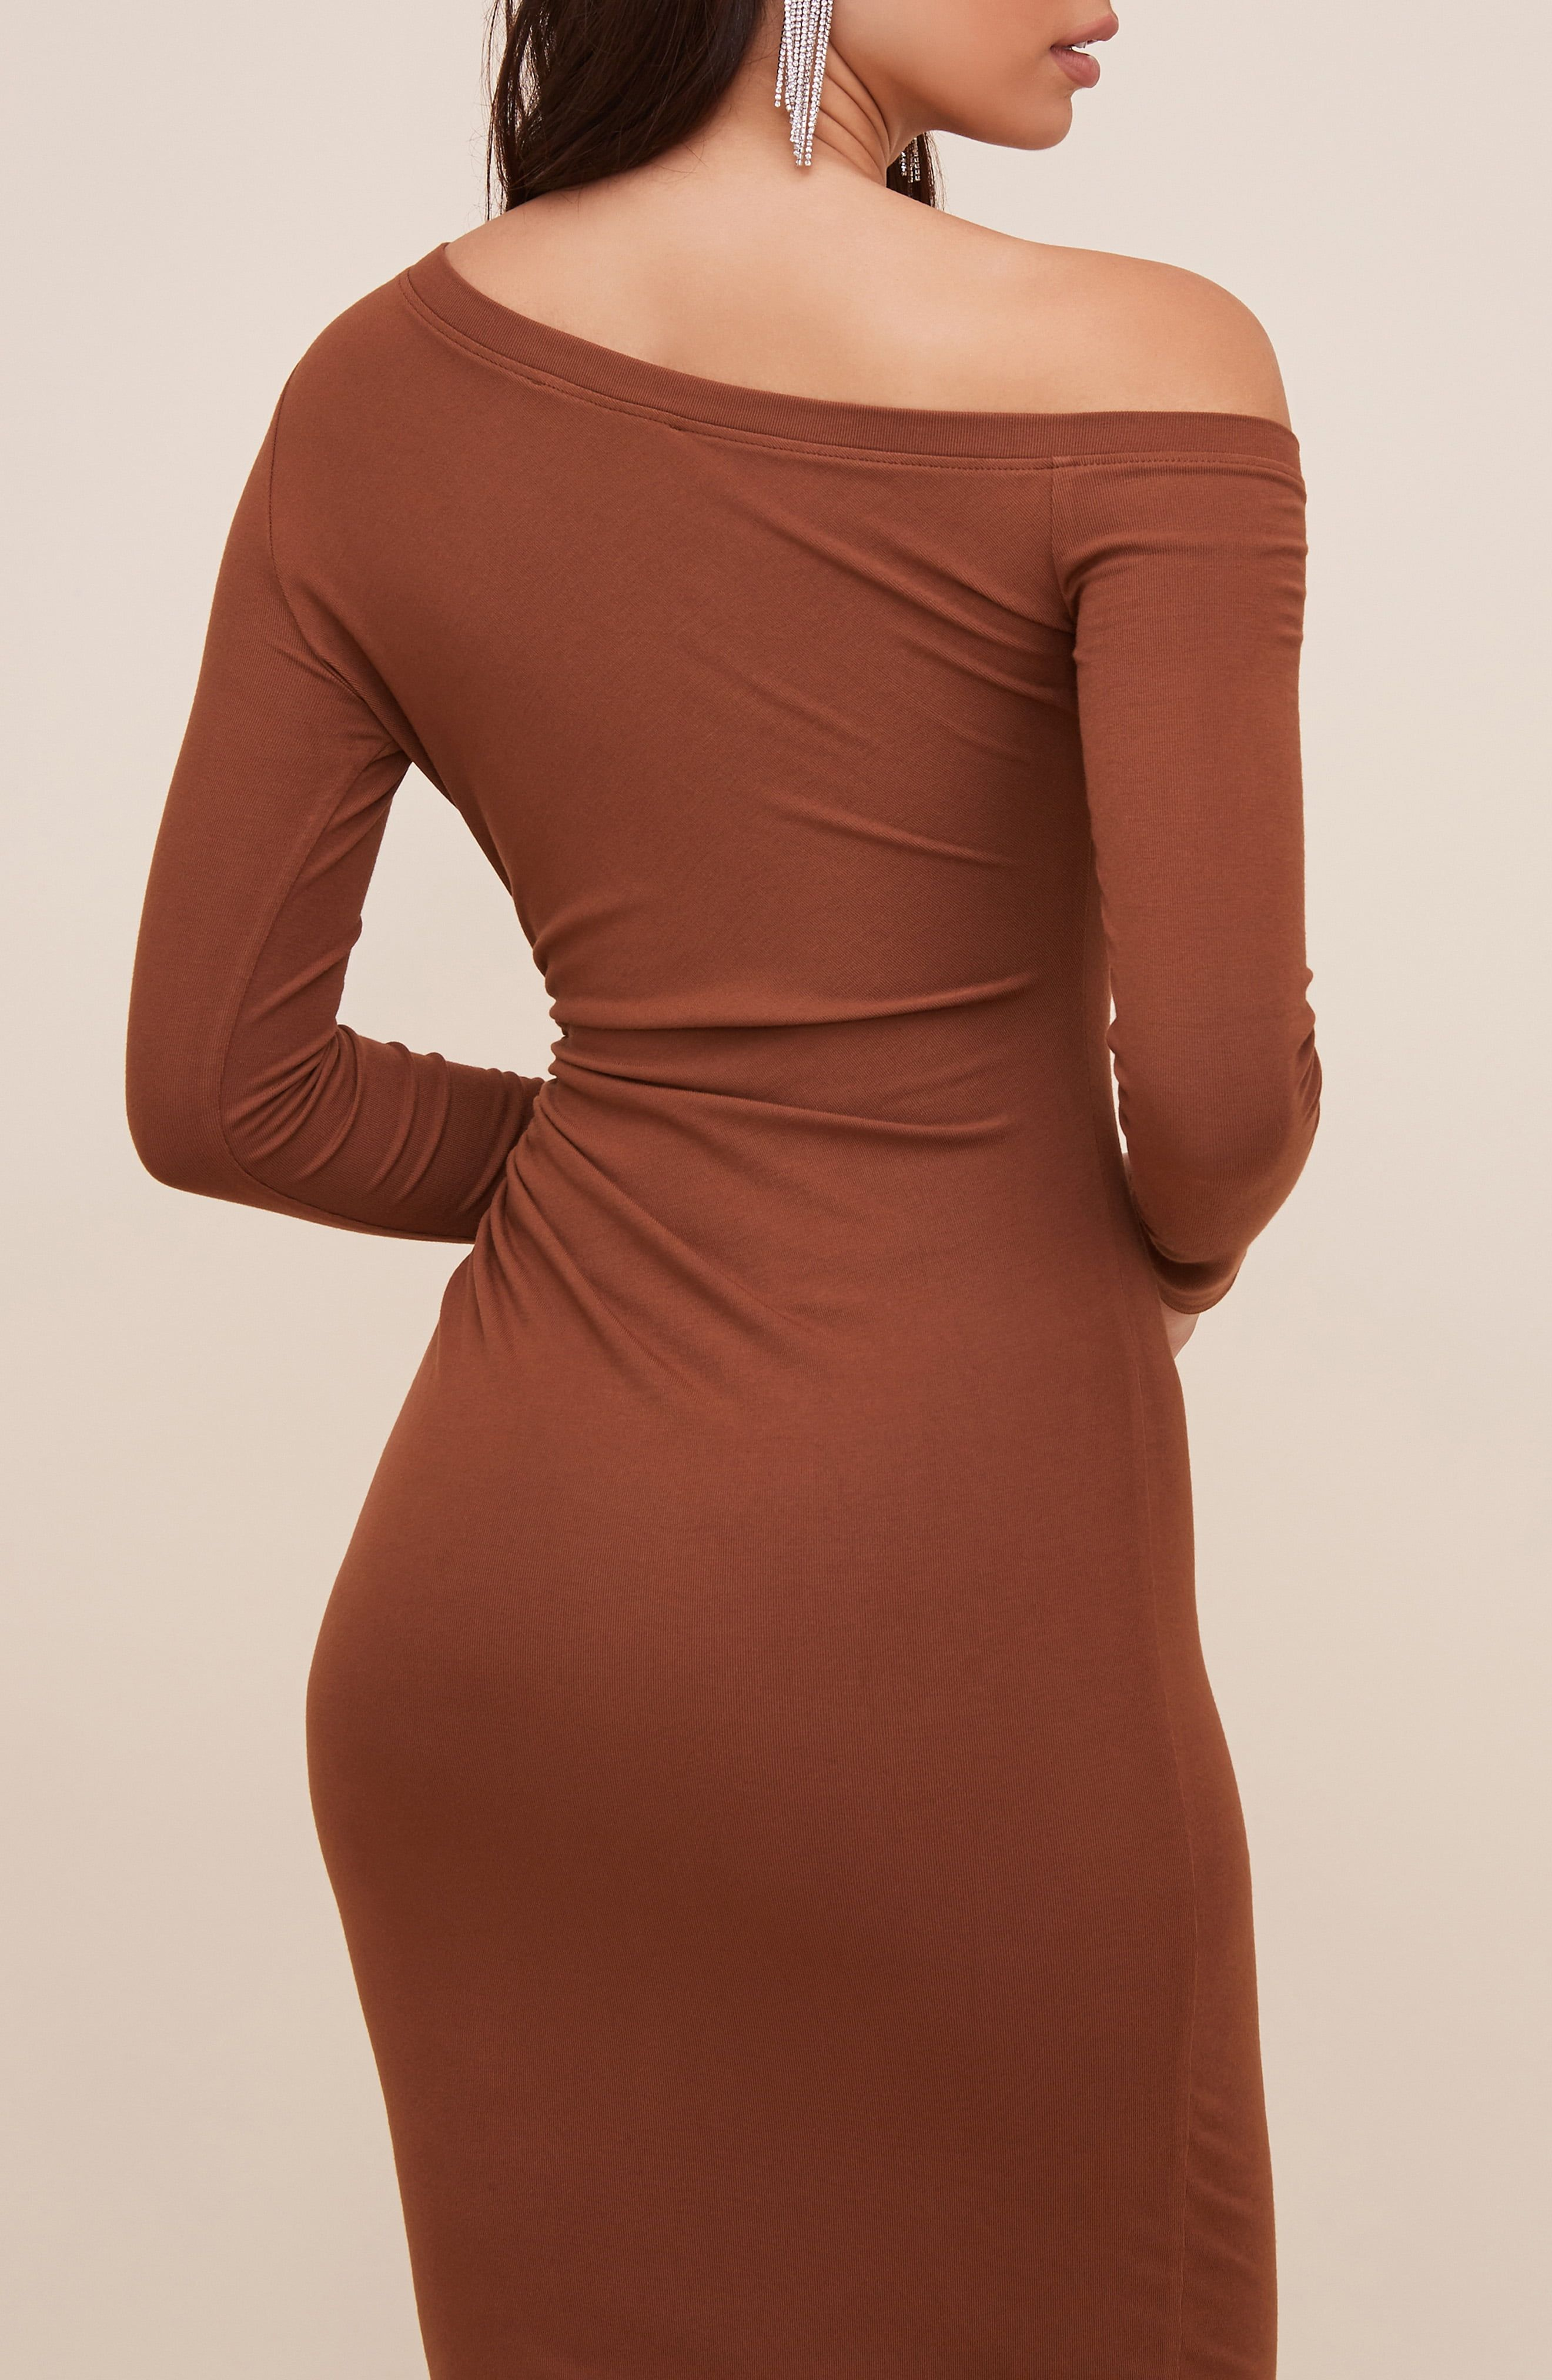 Astr The Label One Shoulder Long Sleeve Midi Dress Nordstrom In 2021 Long Sleeve Midi Dress Midi Dress Dresses [ 4048 x 2640 Pixel ]